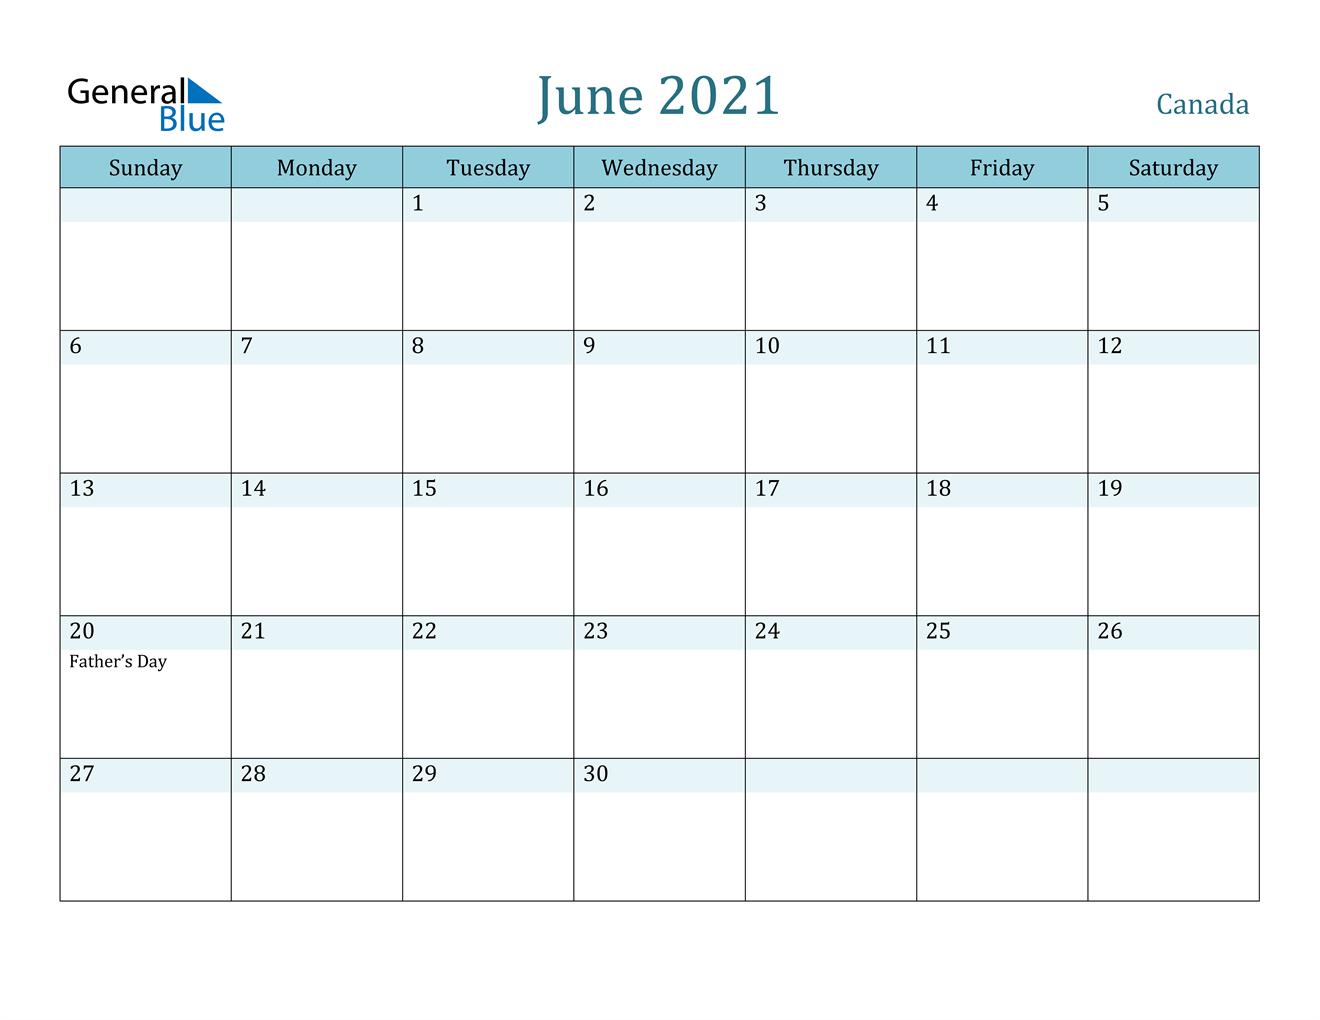 June 2021 Calendar - Canada